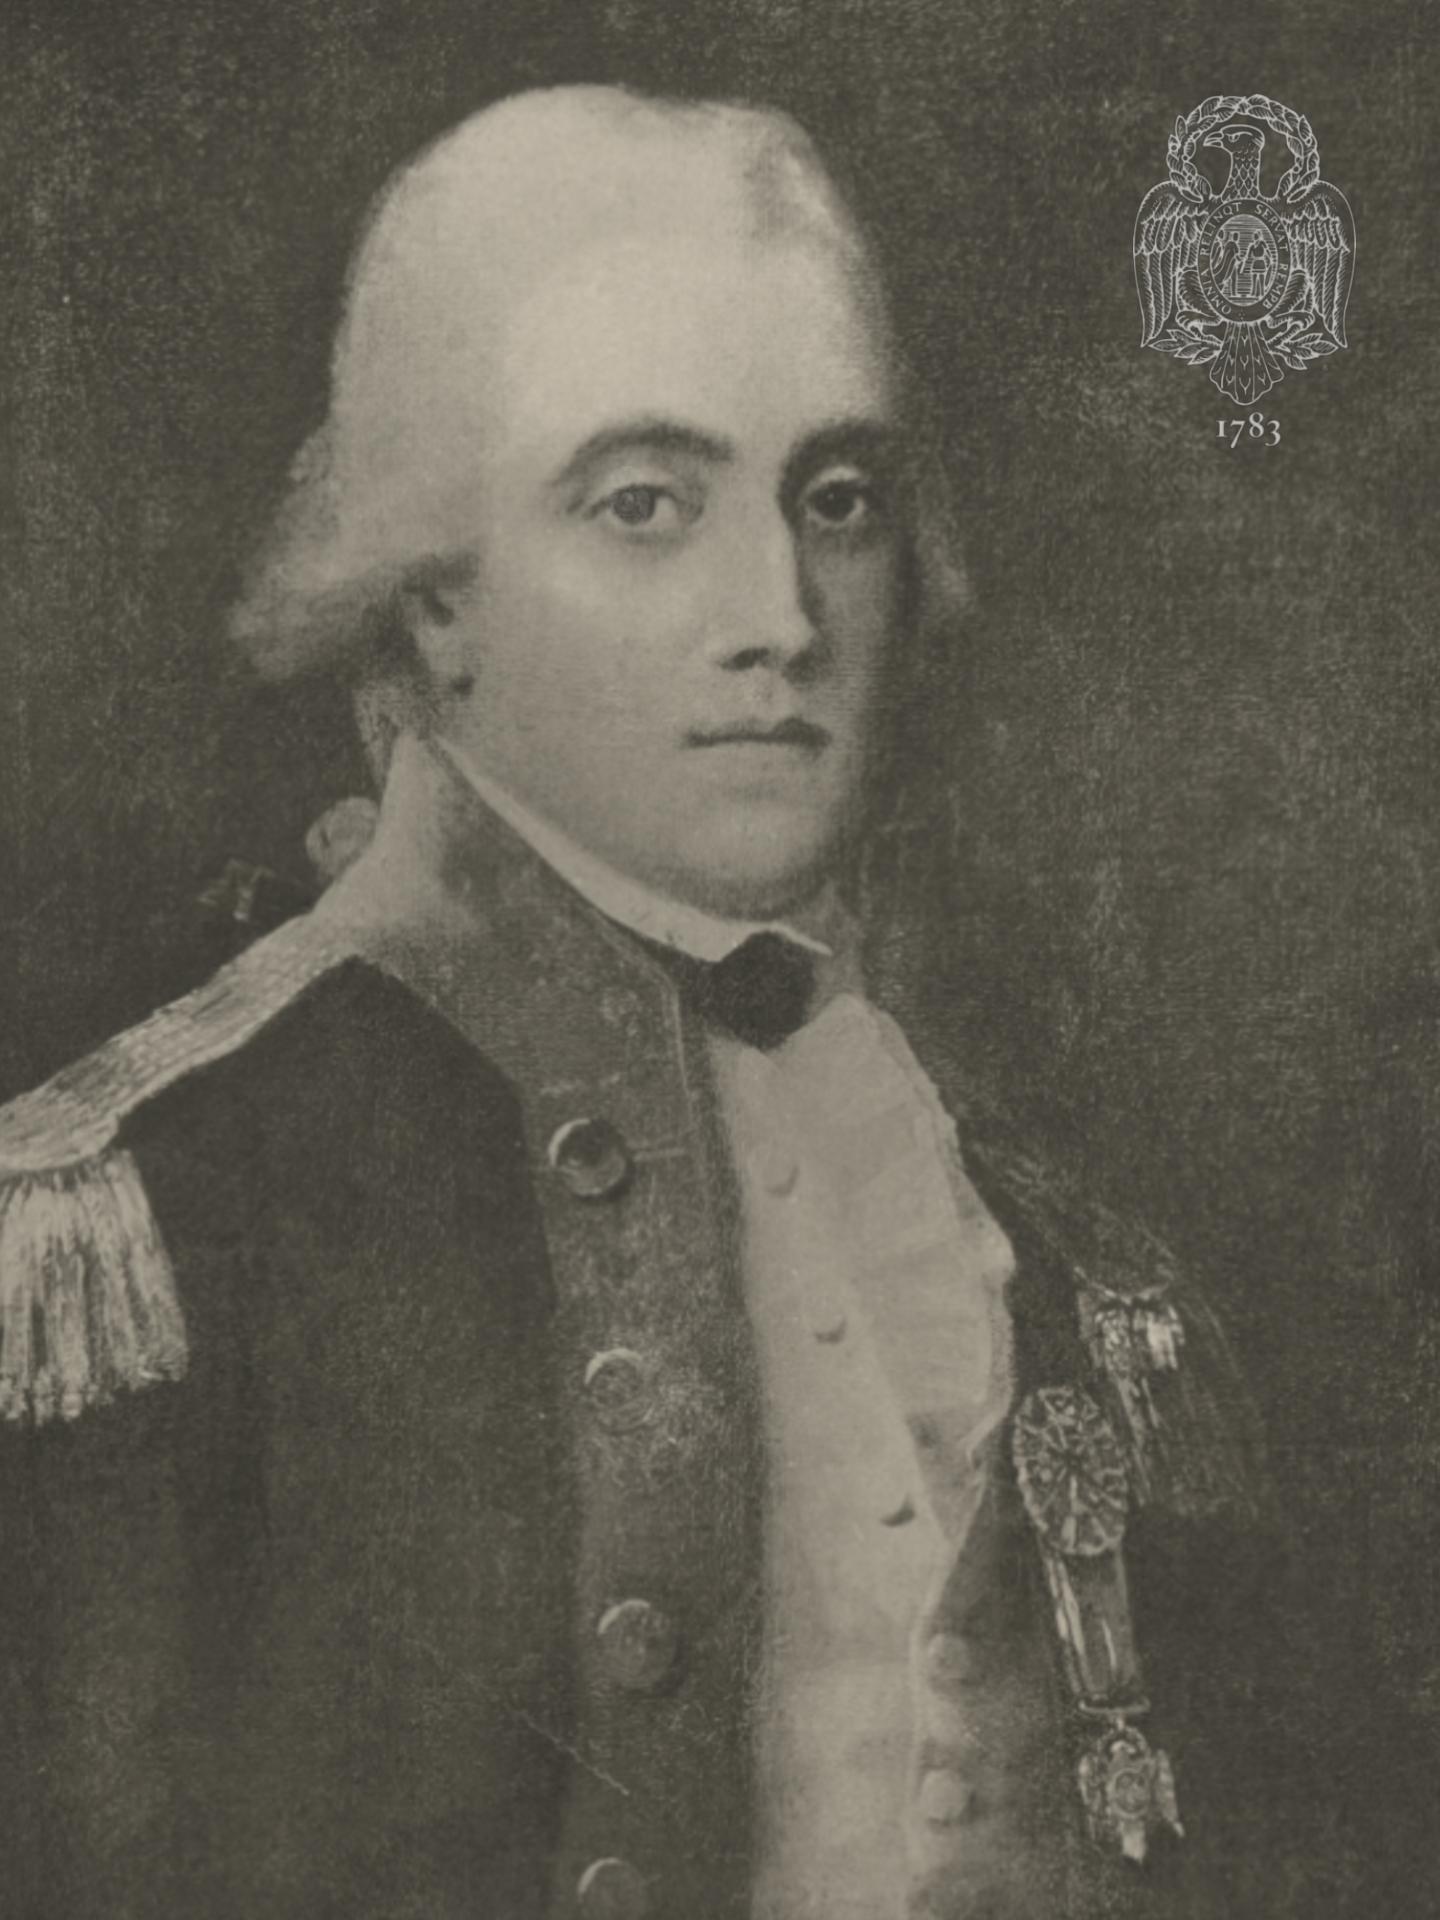 Capt. James Chrystie